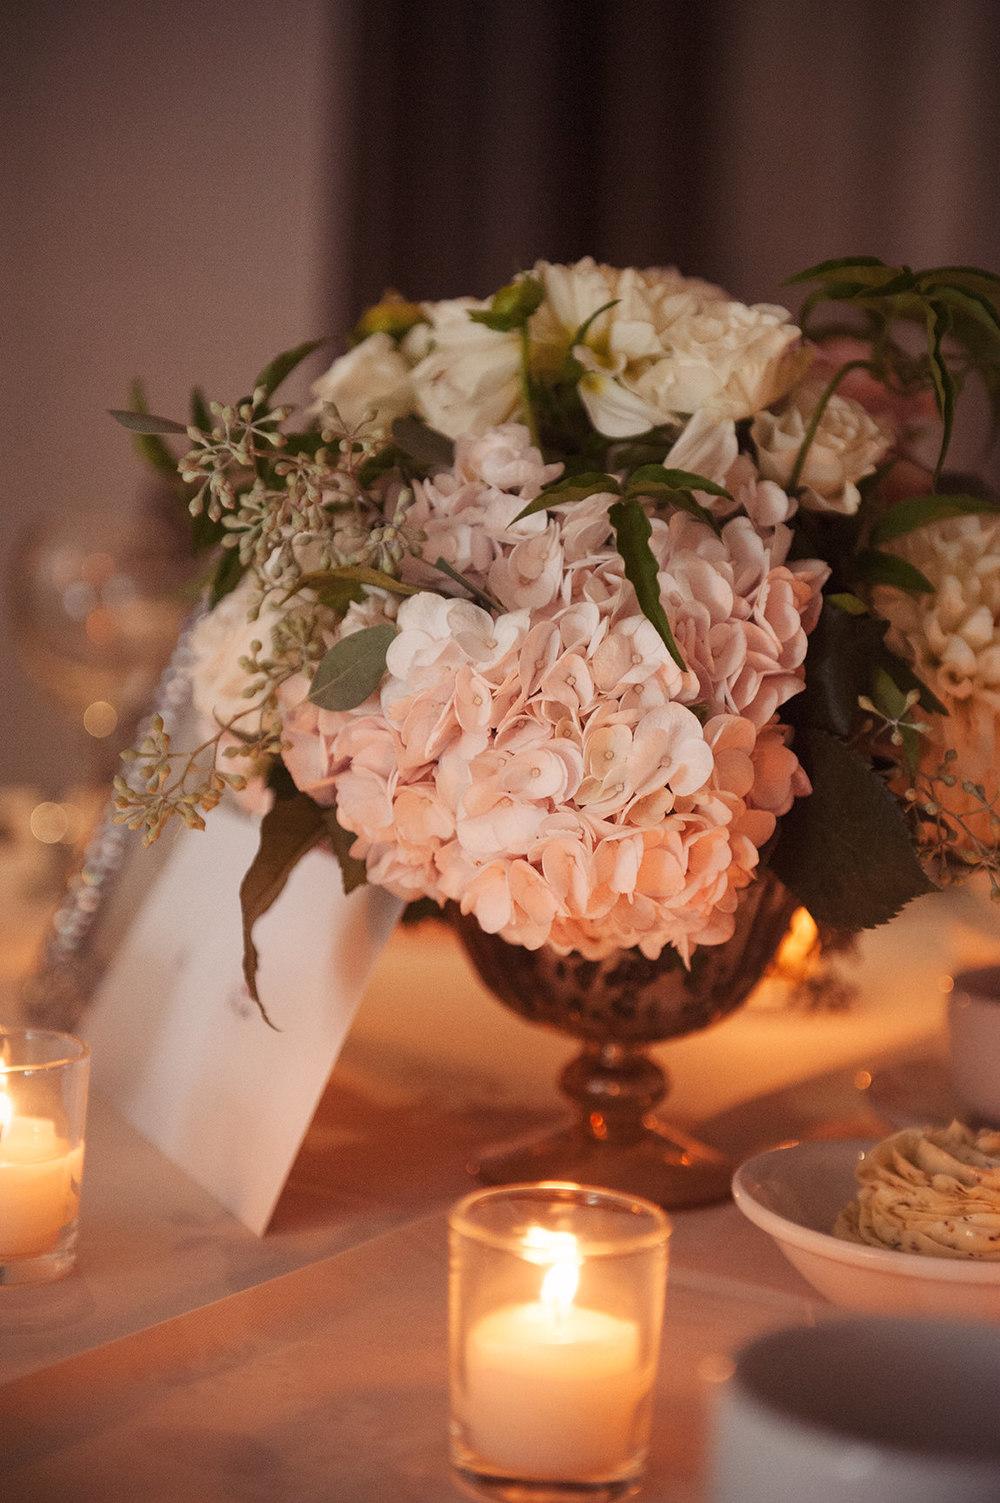 St-Catharines-Wedding-Stone-Mill-Inn-Amy-Darryl-photography-by-Morgan-Falk-102.JPG